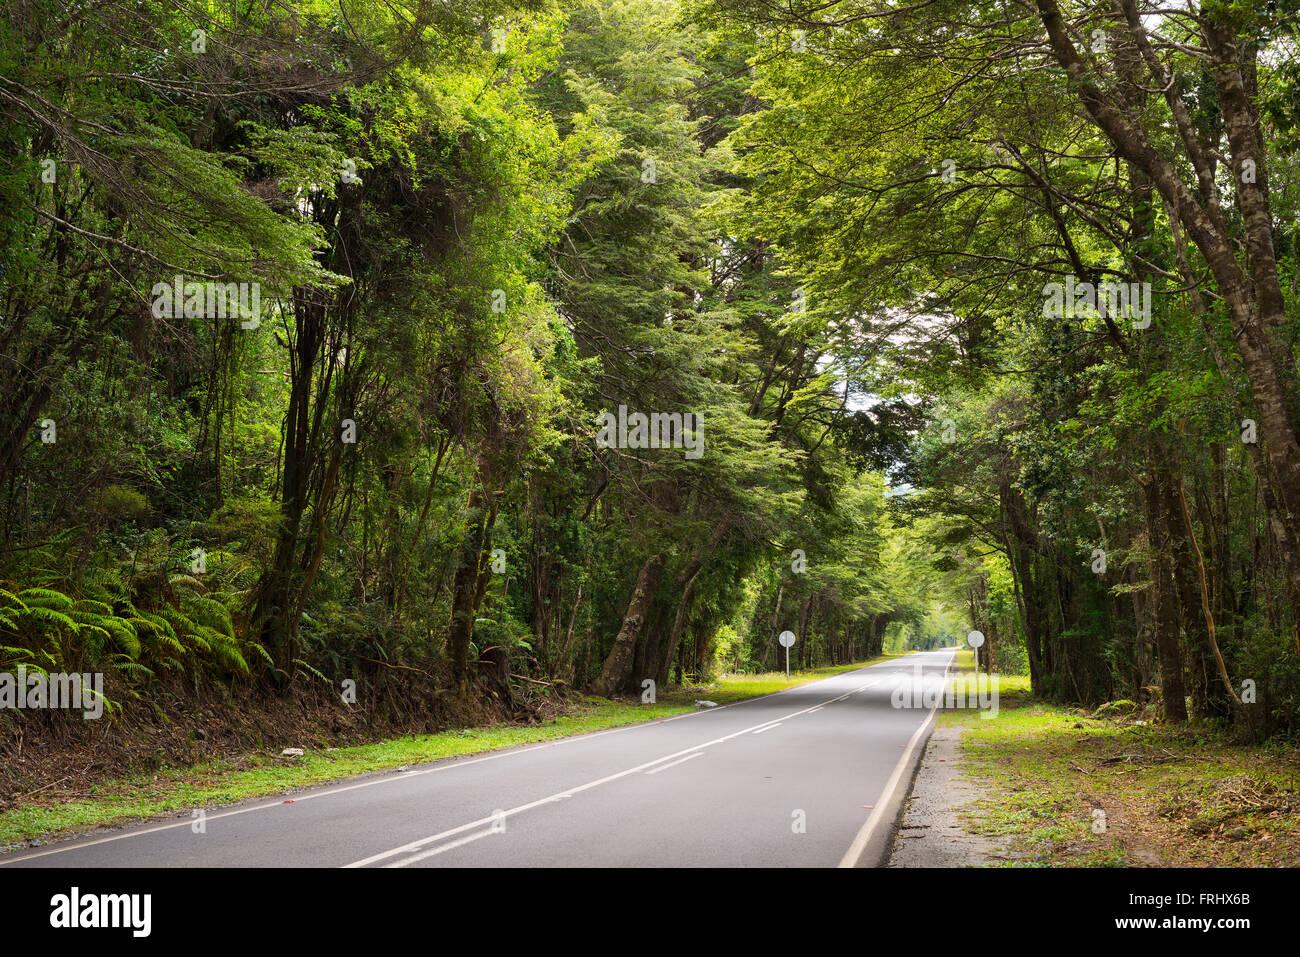 Straße bei Reserva Nacional LLanquihue, Chile Stockbild